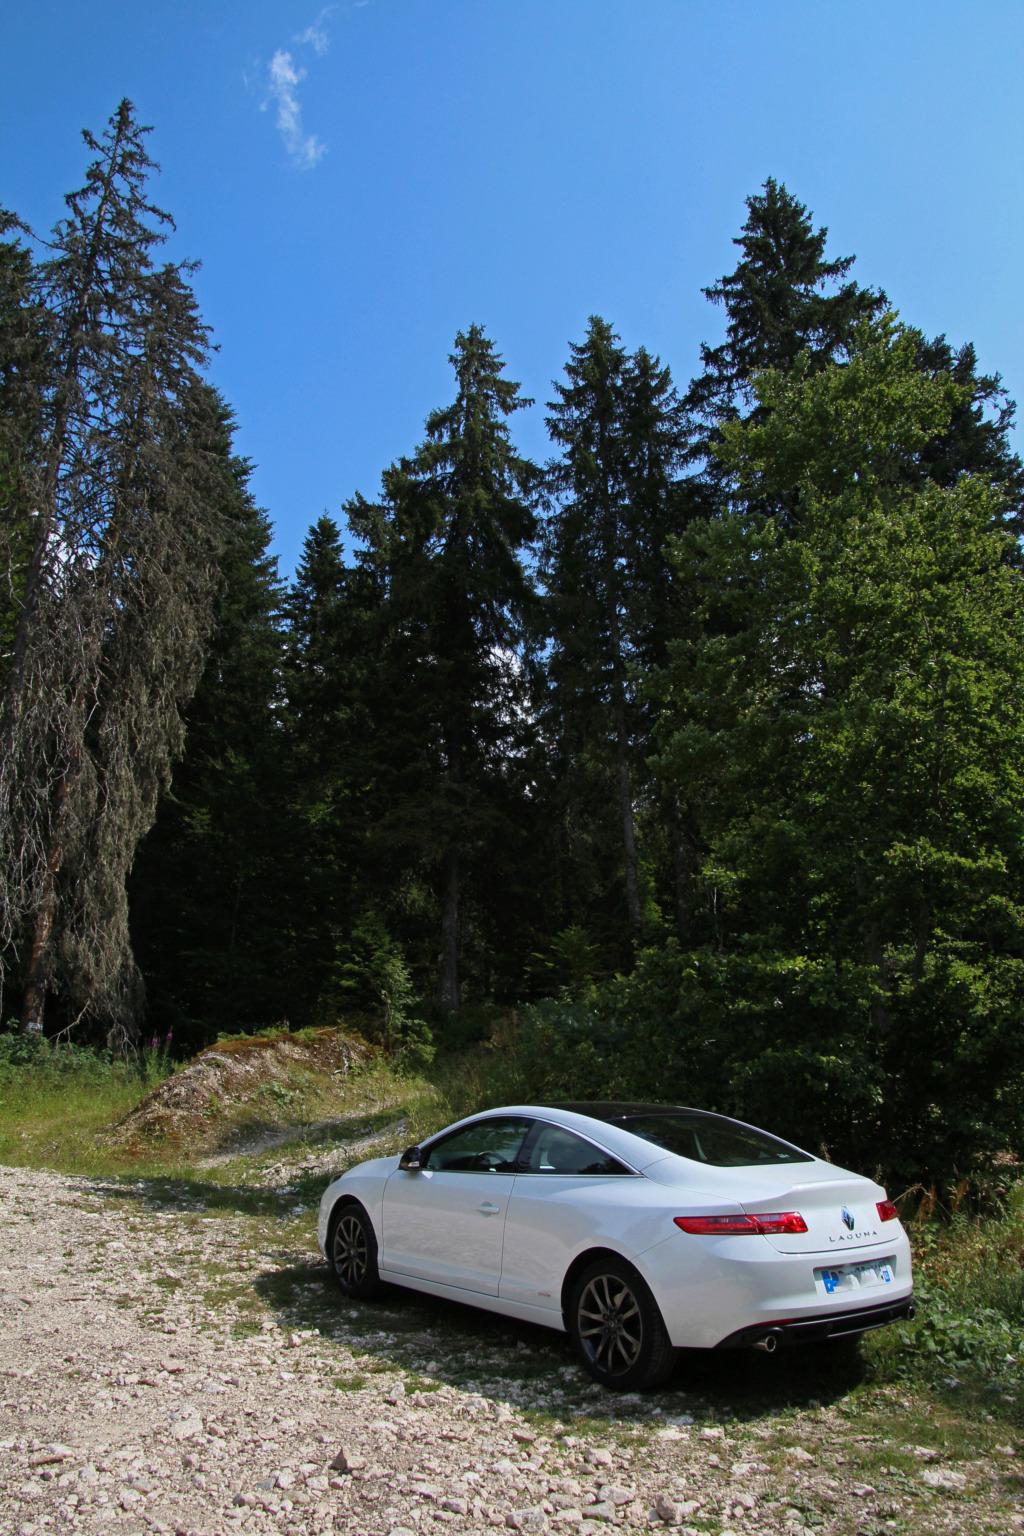 [Laurent66] LAGUNA III.2 Coupé 2.0 dCi 175 cv GP Monaco Bose Img_6310